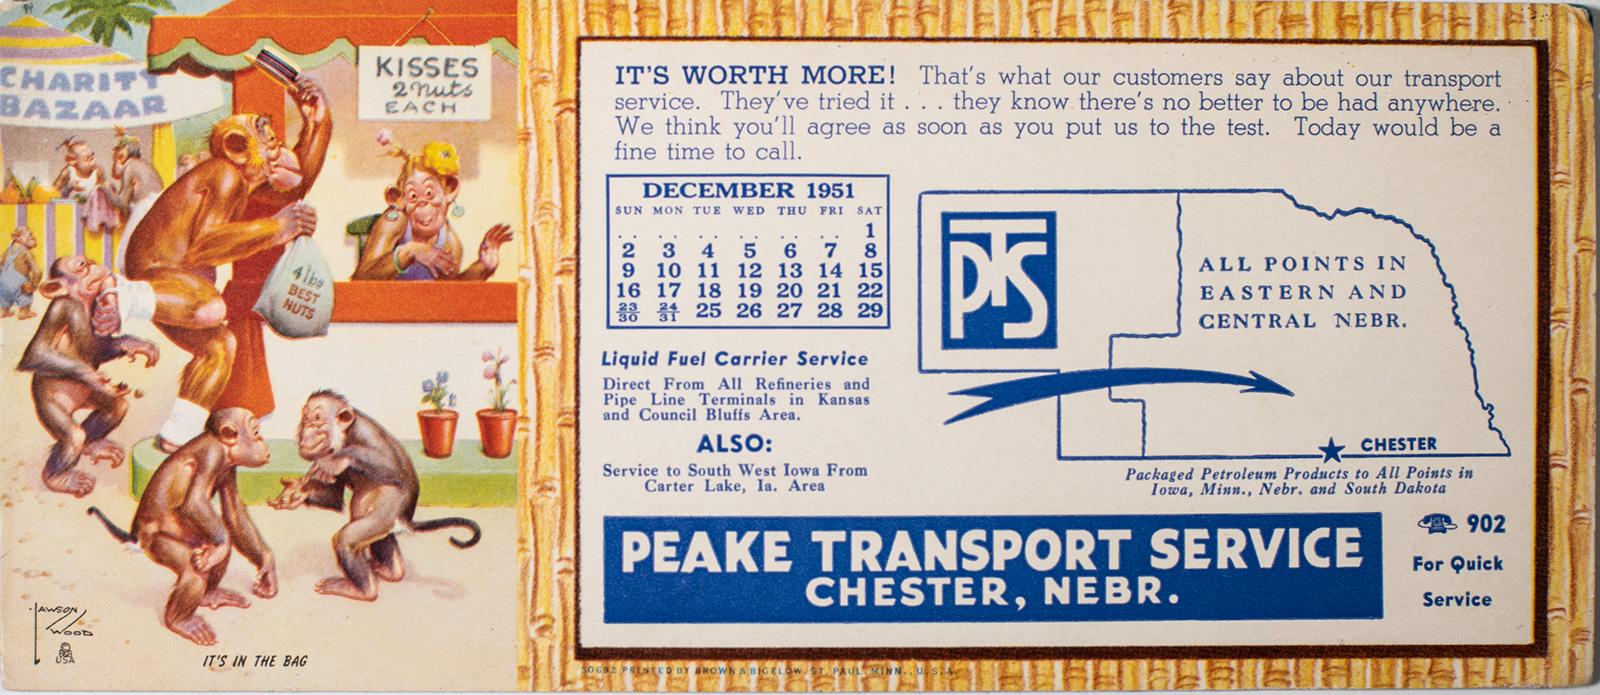 Peake Transport Blotter Pad & Calendar Image